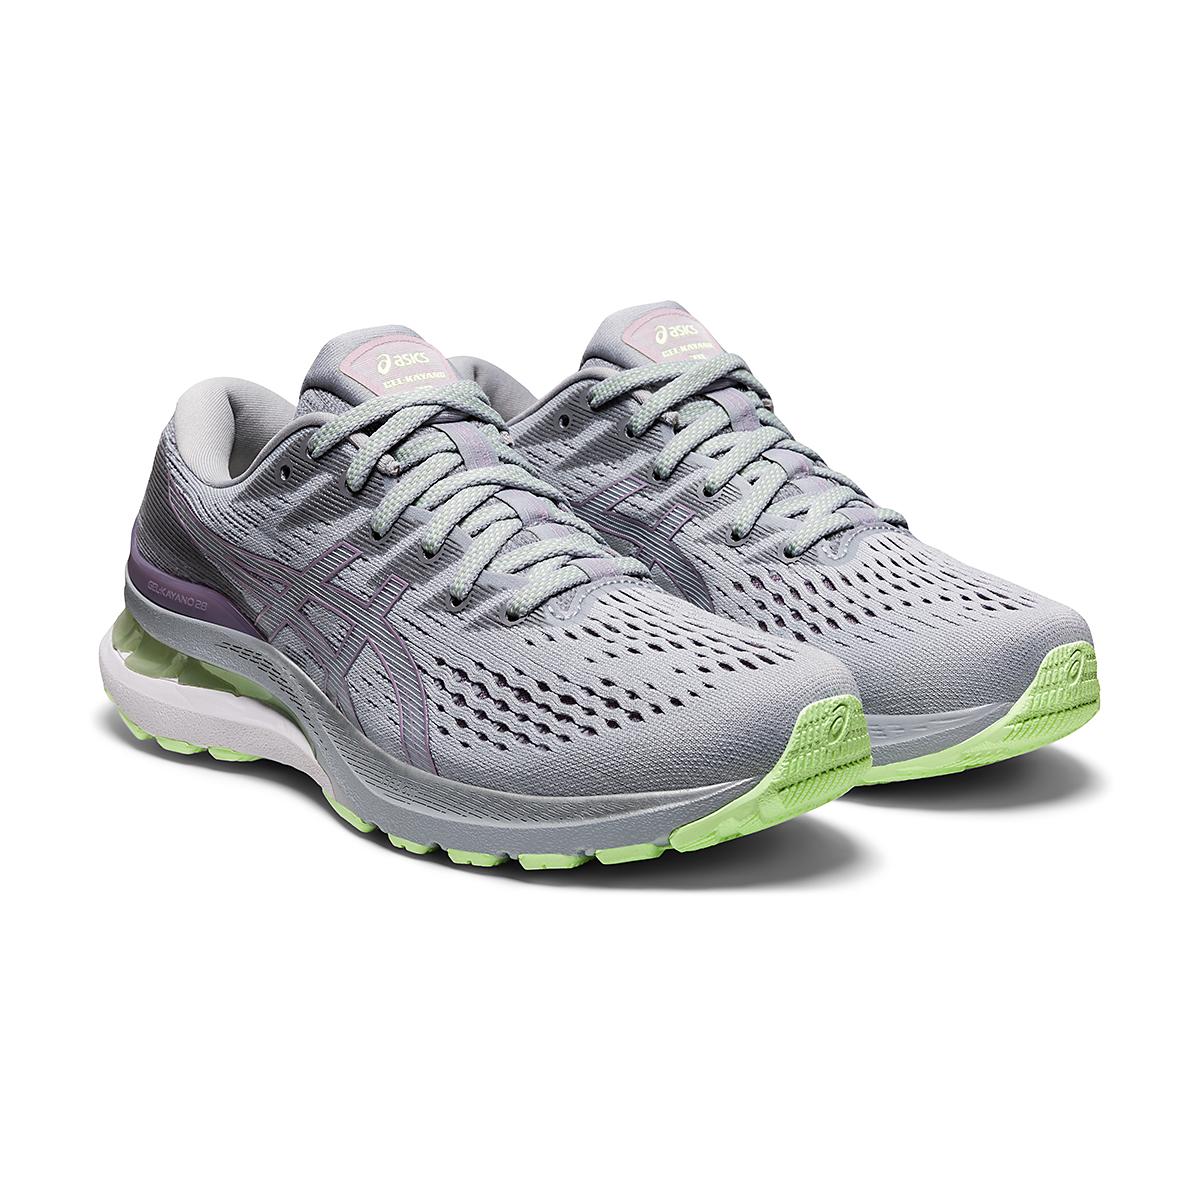 Women's Asics Gel-Kayano 28 Running Shoe - Color: Piedmont Grey/Lavender - Size: 5 - Width: Regular, Piedmont Grey/Lavender, large, image 3